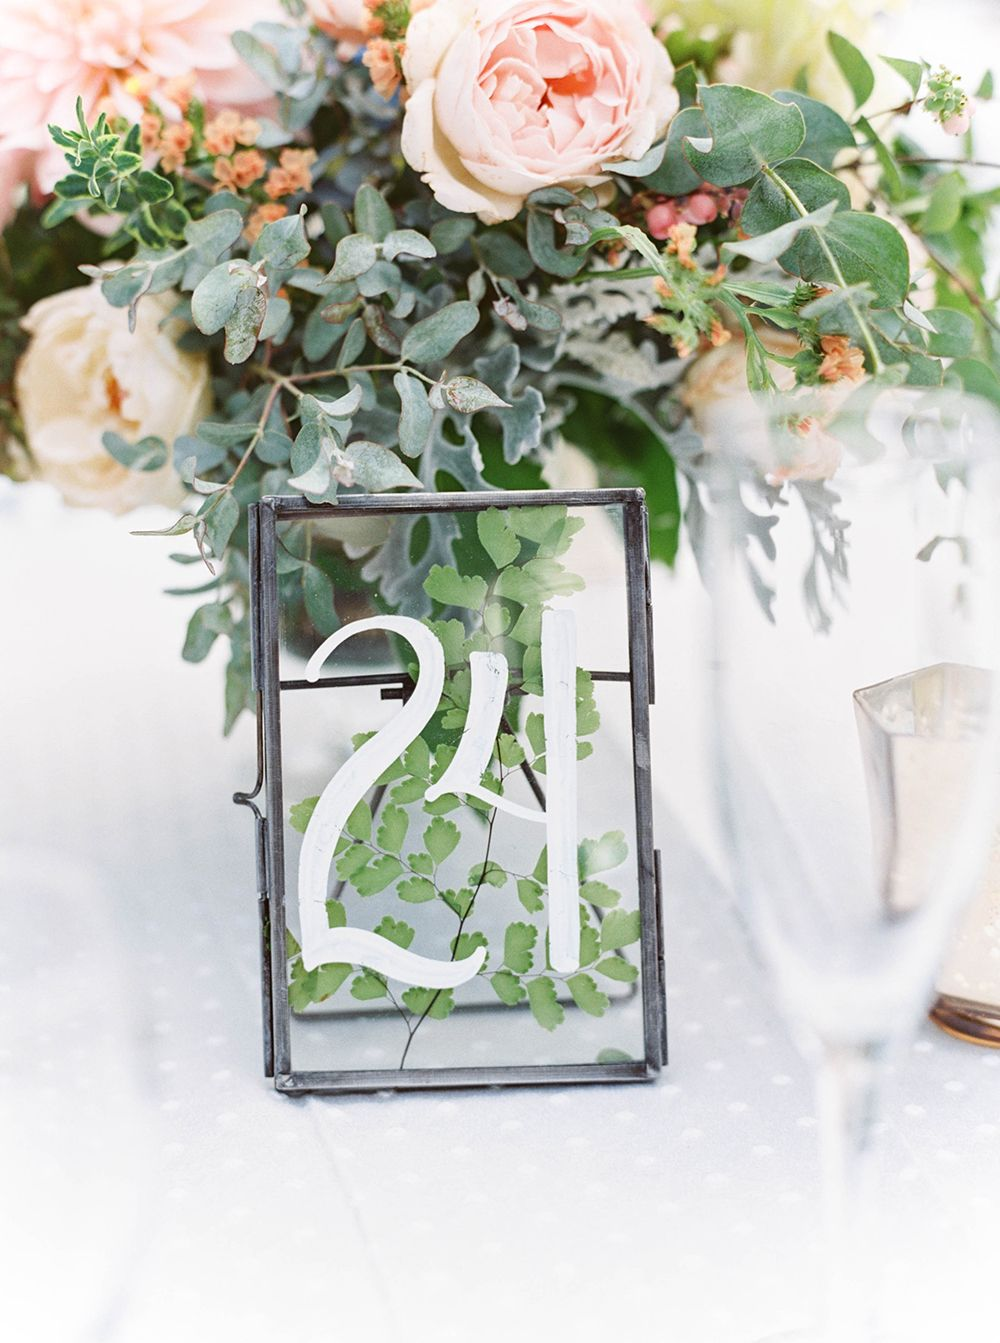 Scenic Mt. Hood Organic Farms Wedding   Wedding tables, Table ...